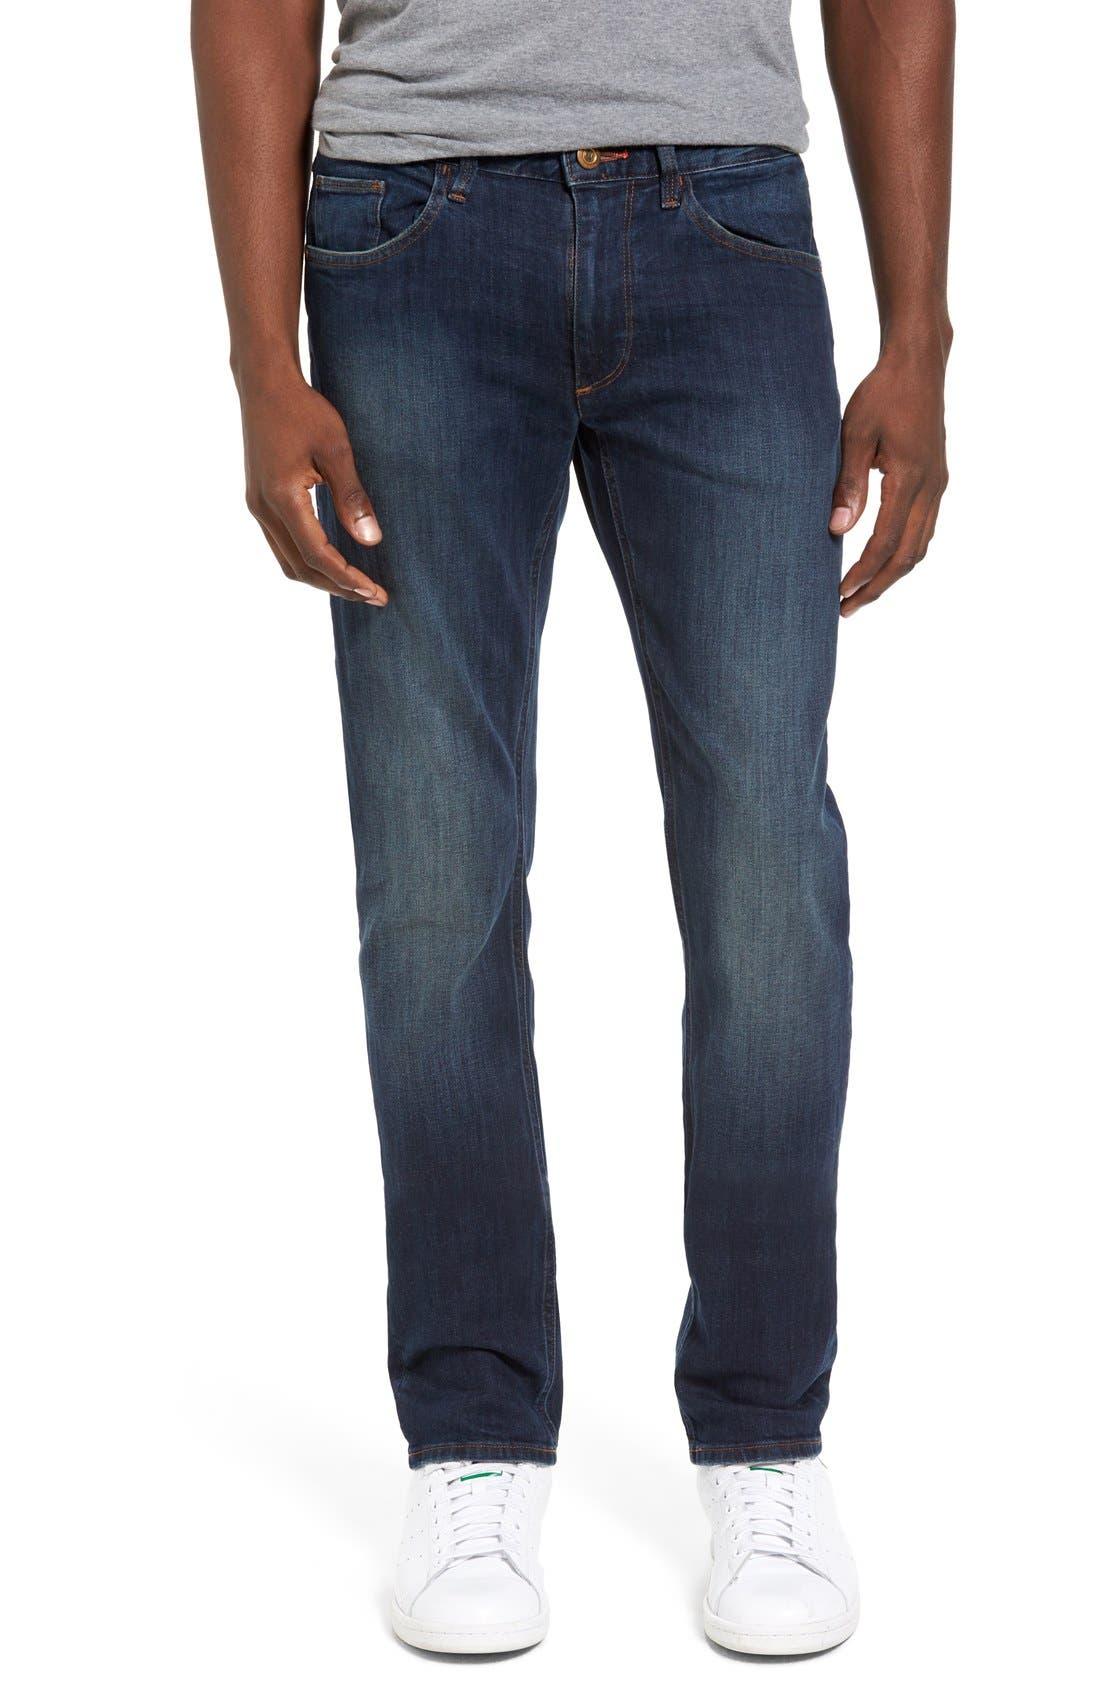 Spitfire Slim Fit Jeans,                             Alternate thumbnail 5, color,                             INDIGO